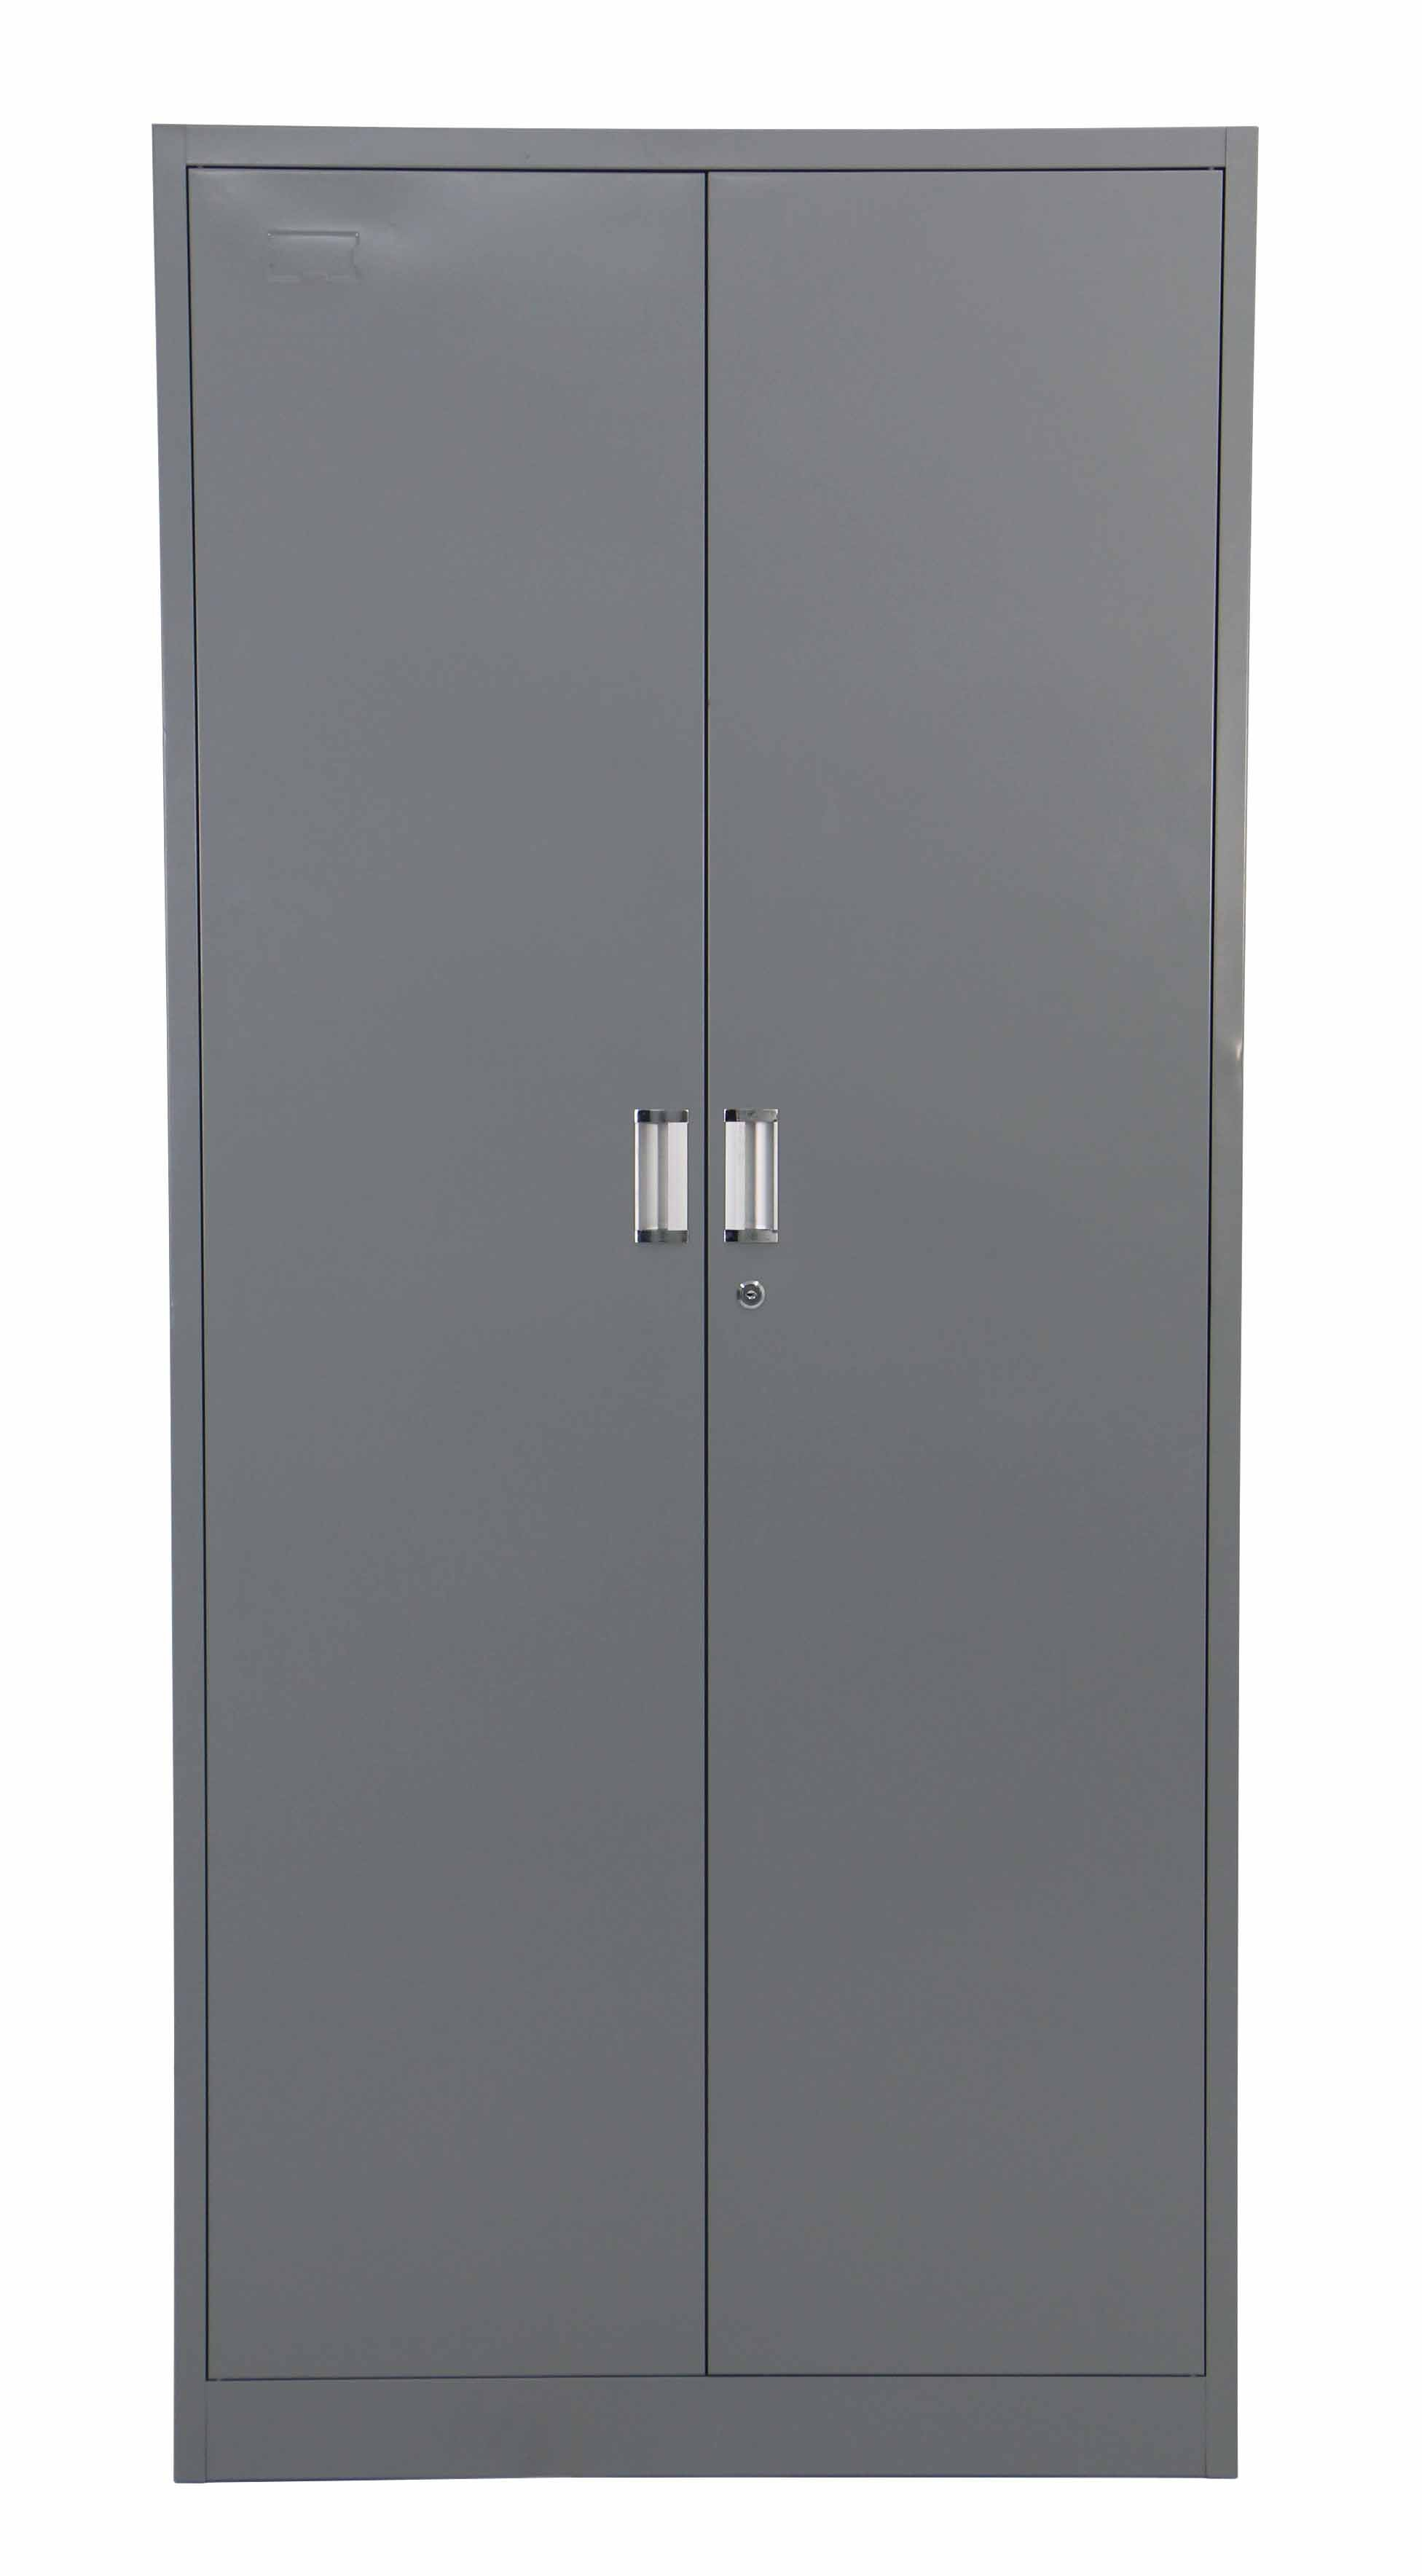 other organize organizer closet drawer to tips home of organization areas x walmart wardrobe help metal